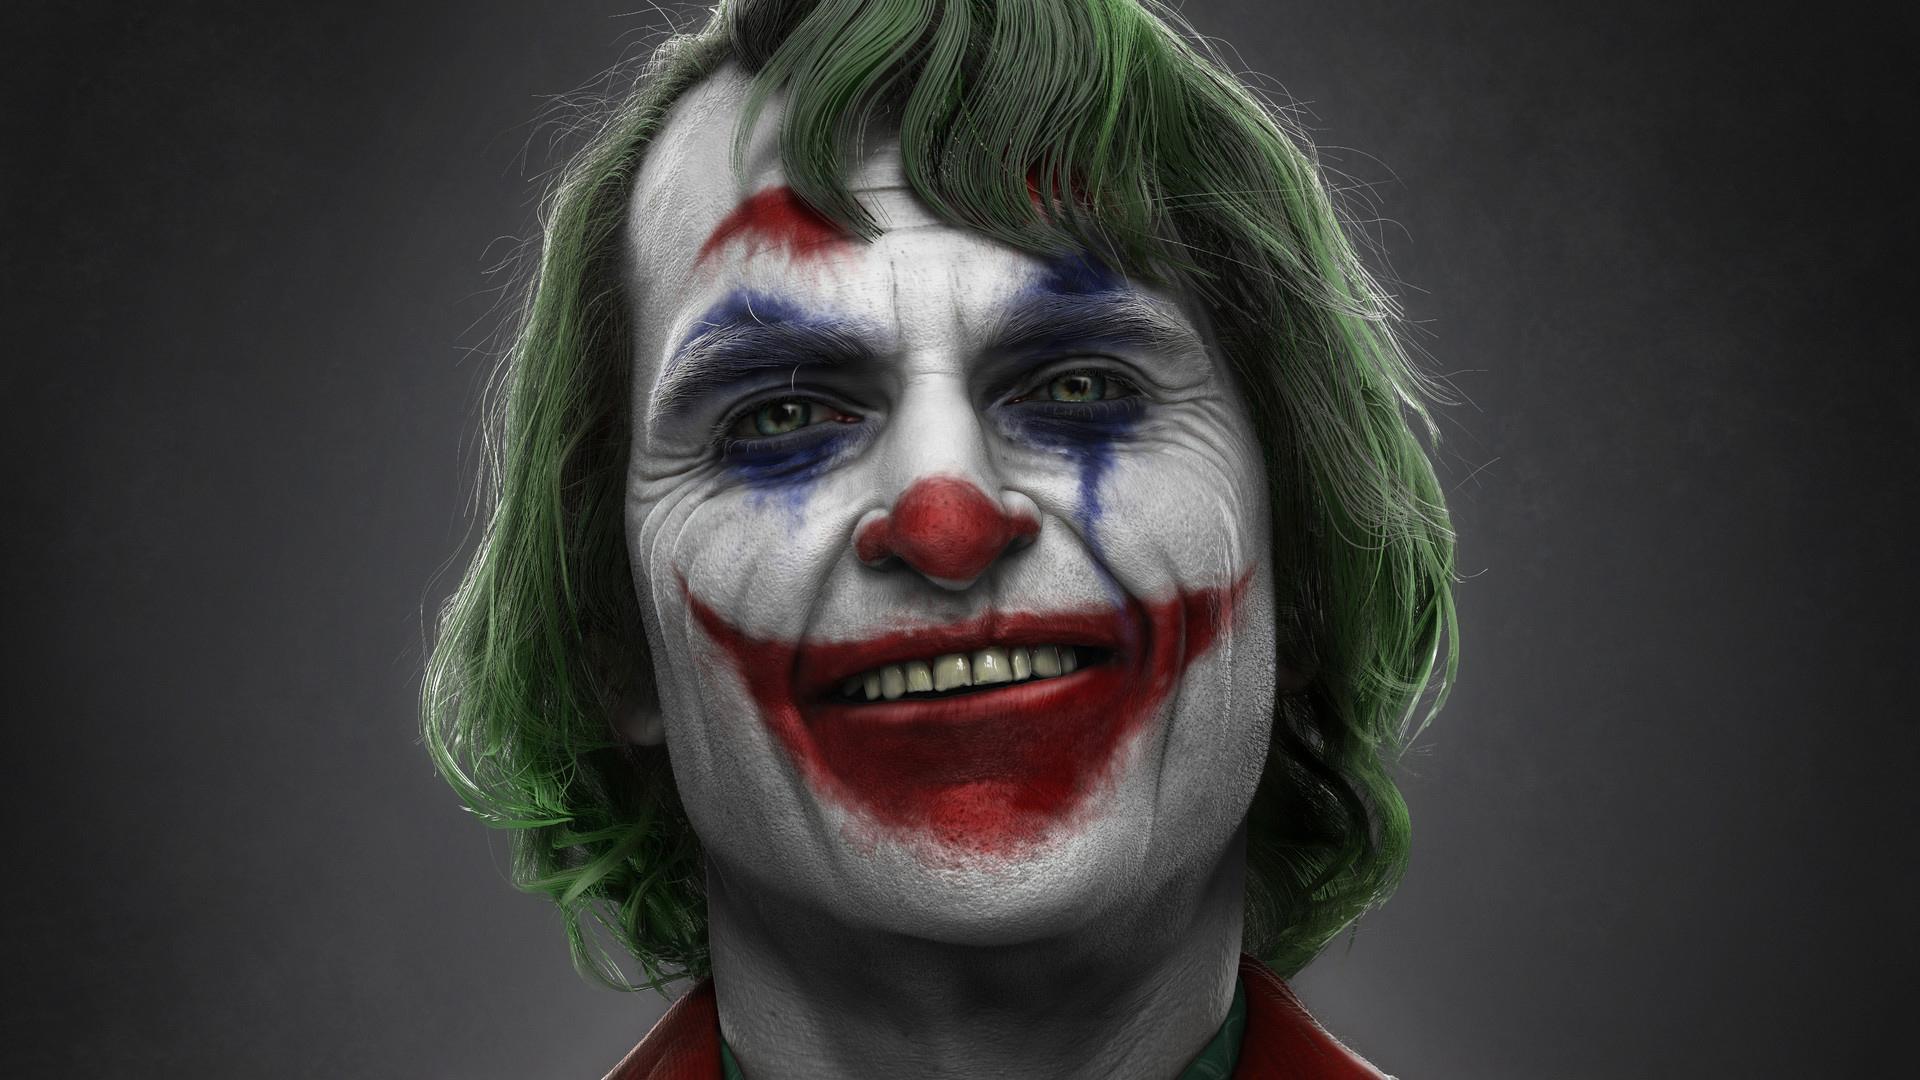 Phoenix Wallpaper Hd 3d Joker Joaquin Phoenix Art Hd Superheroes 4k Wallpapers